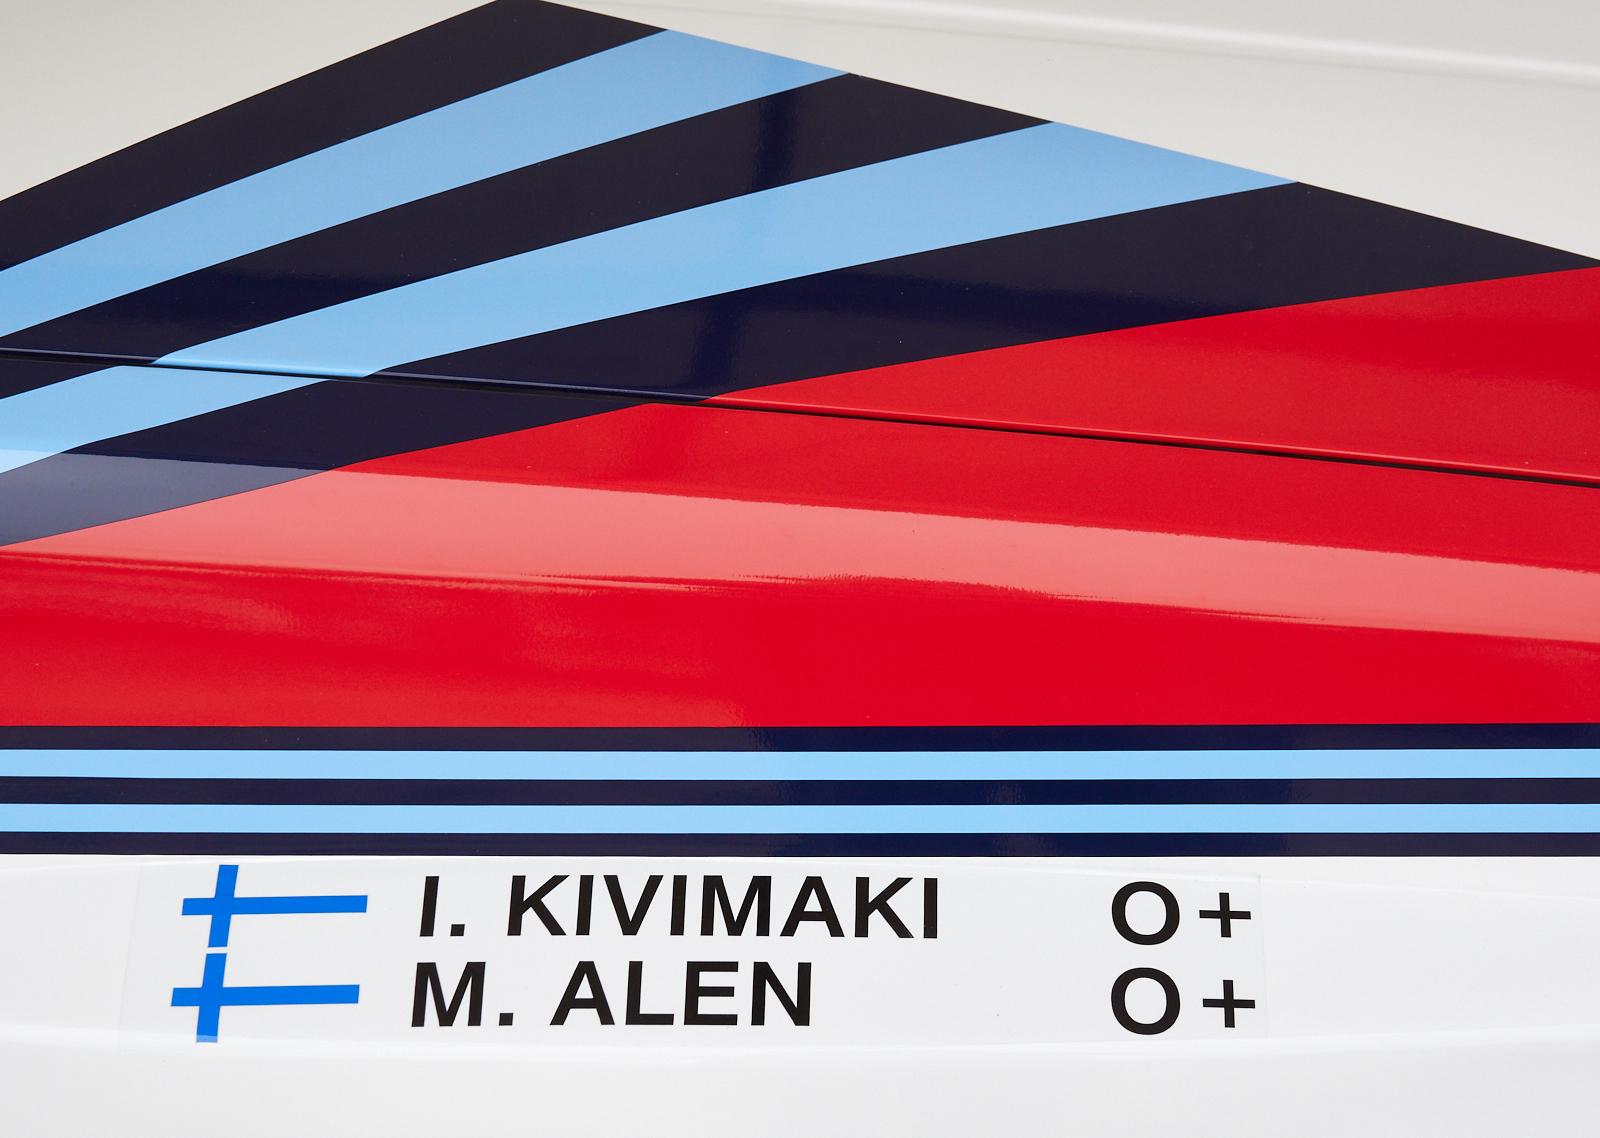 Martini 1600x1200 sRGB.jpg